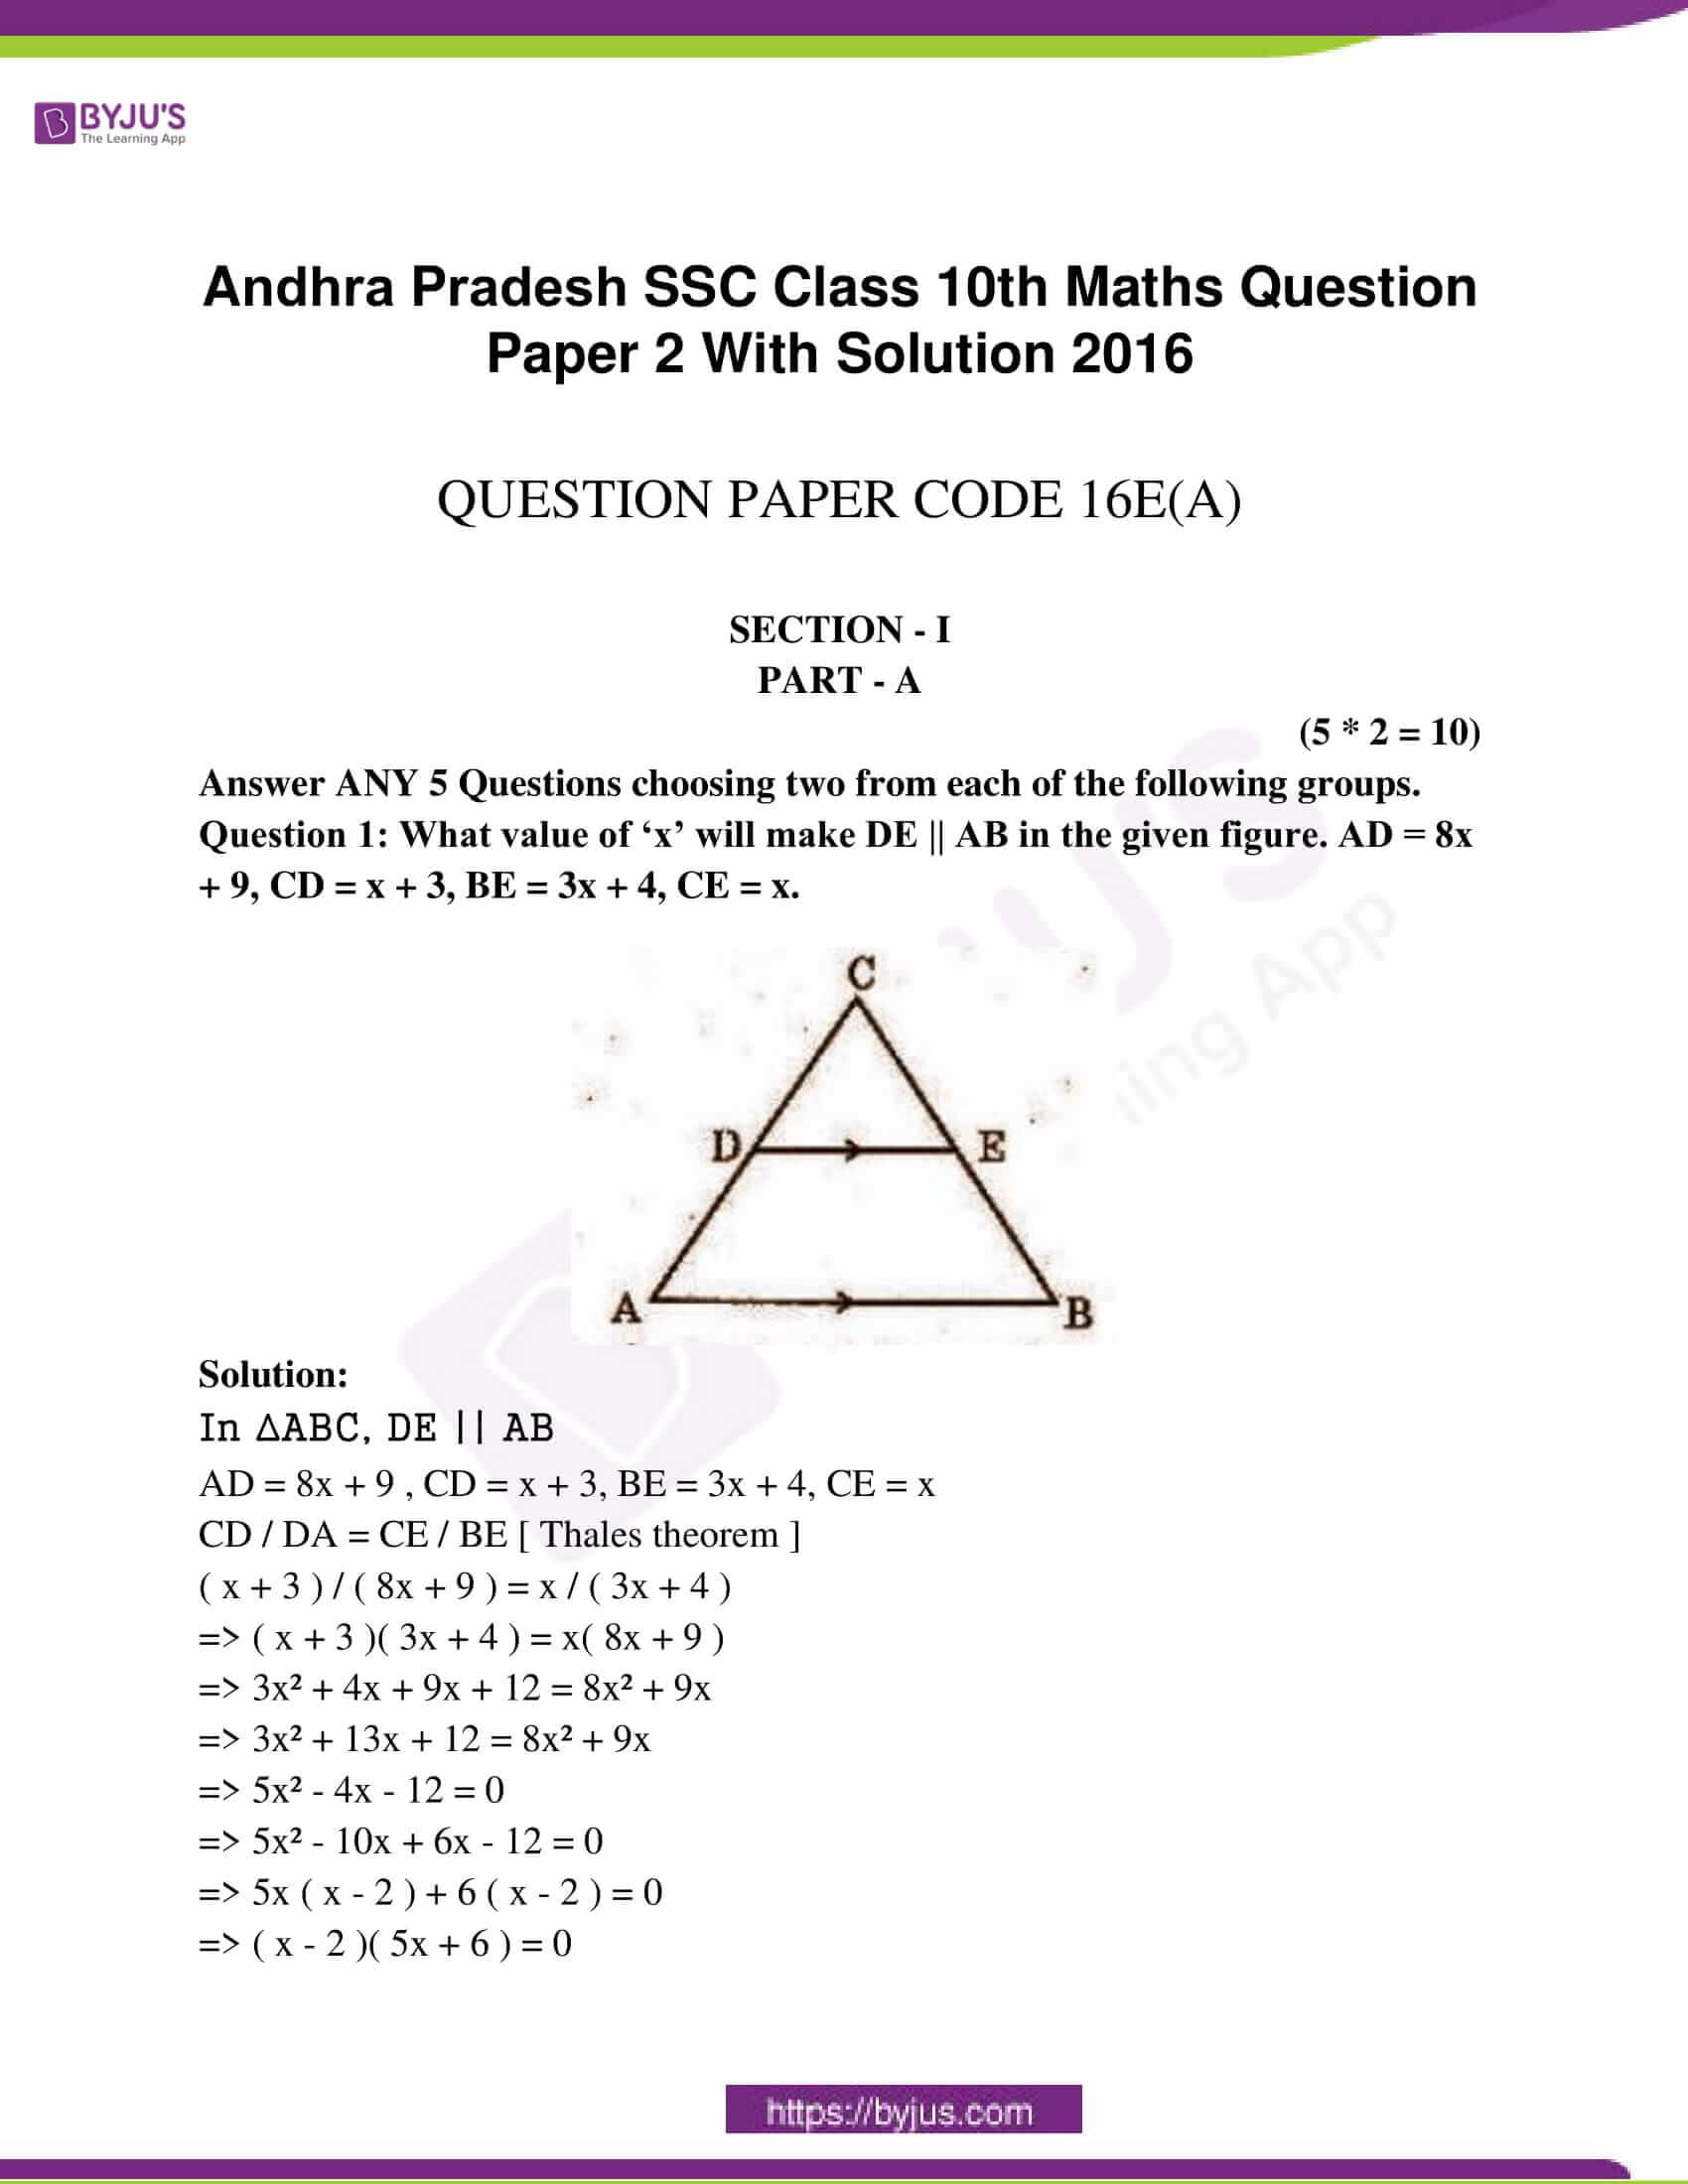 ap class 10 maths question paper 2 sol march 2016 01